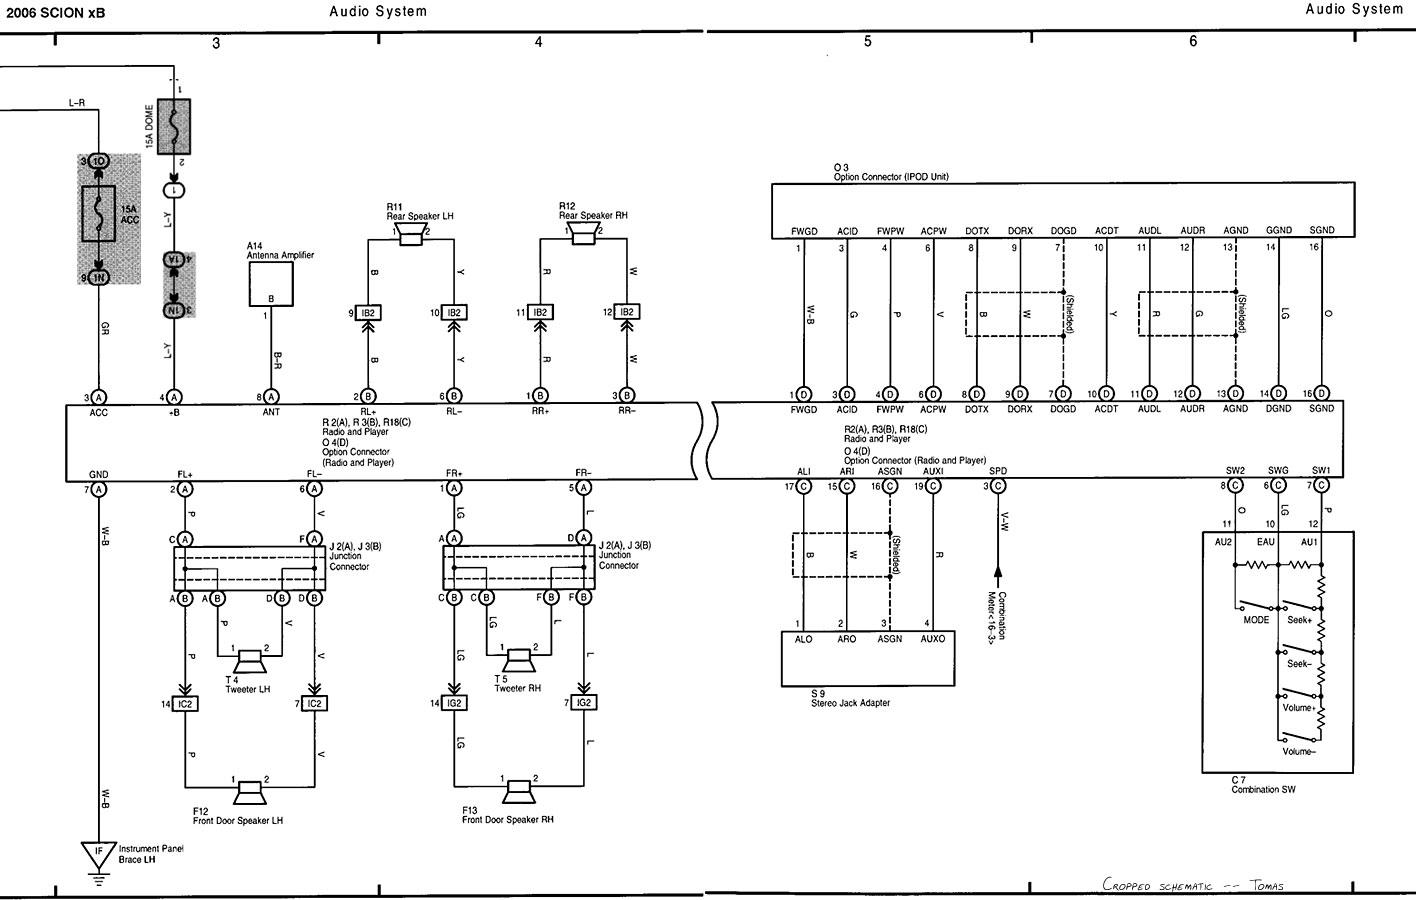 Scion Xb Headlight Diagram Wiring Diagrams Hubs Dodge Magnum Stereo 05 Headlamp Data Today 2008 Headlights